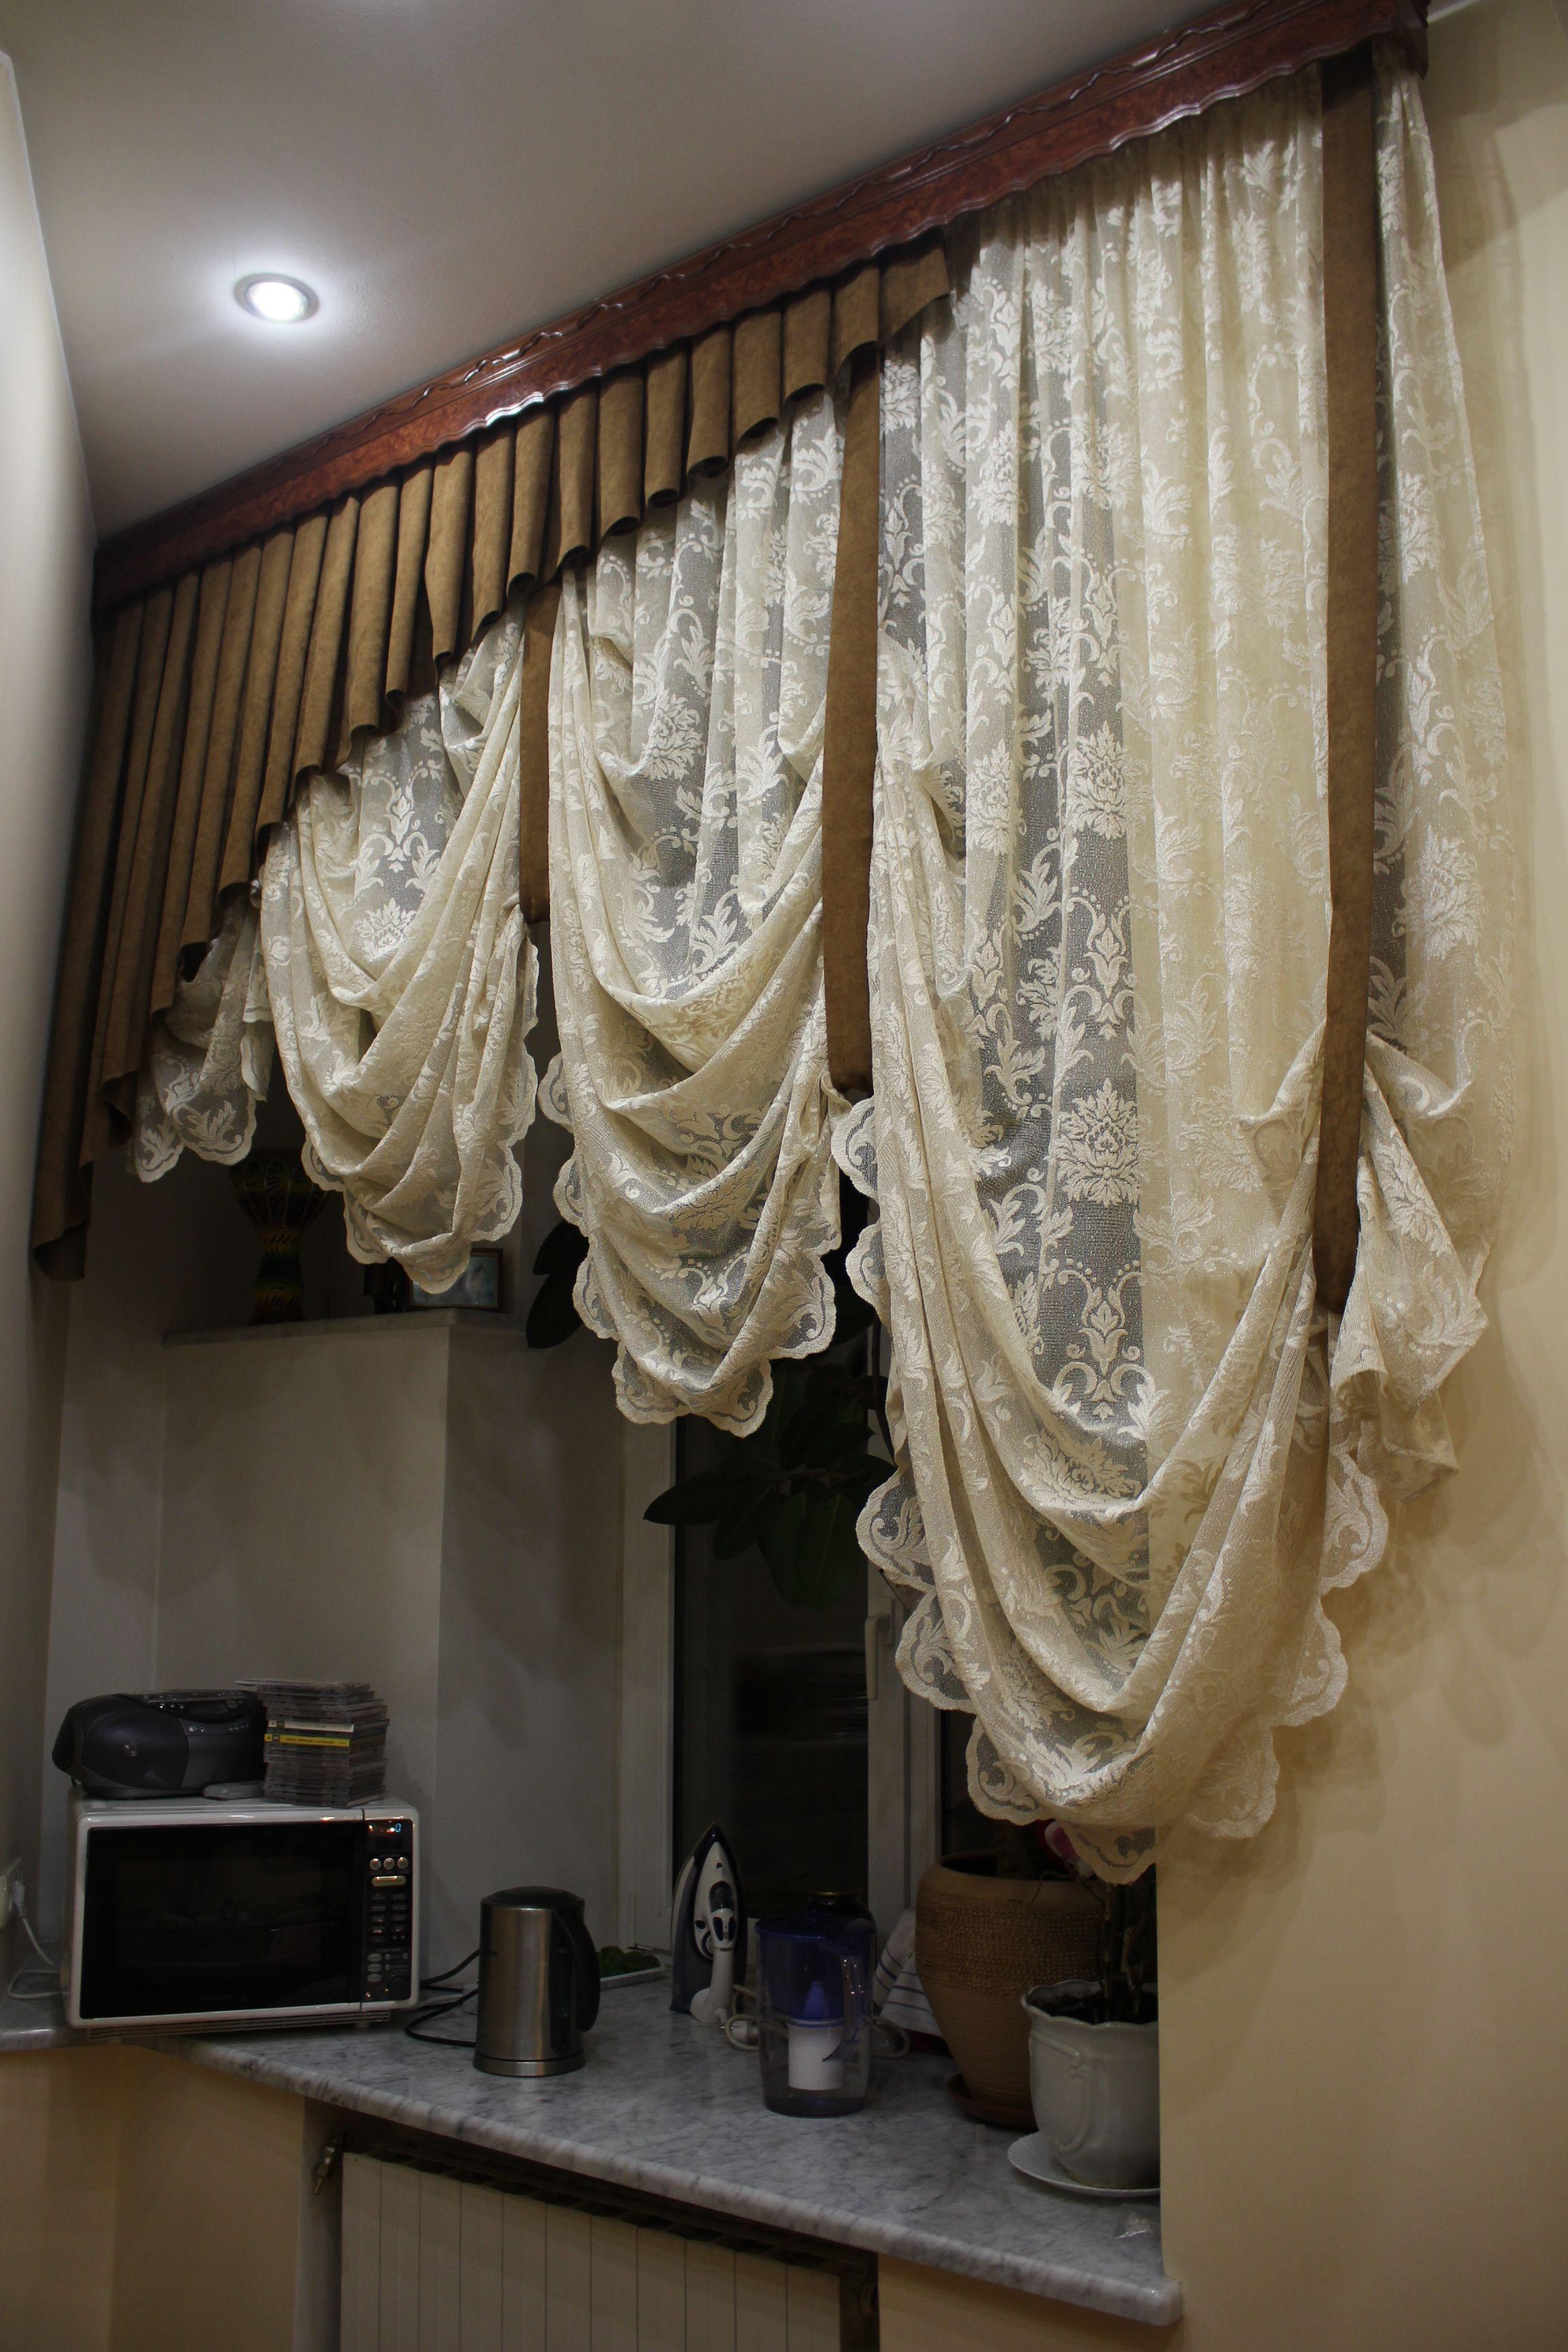 Pin by Galina Nadolinnaya on Curtains   Curtain decor, Victorian ...